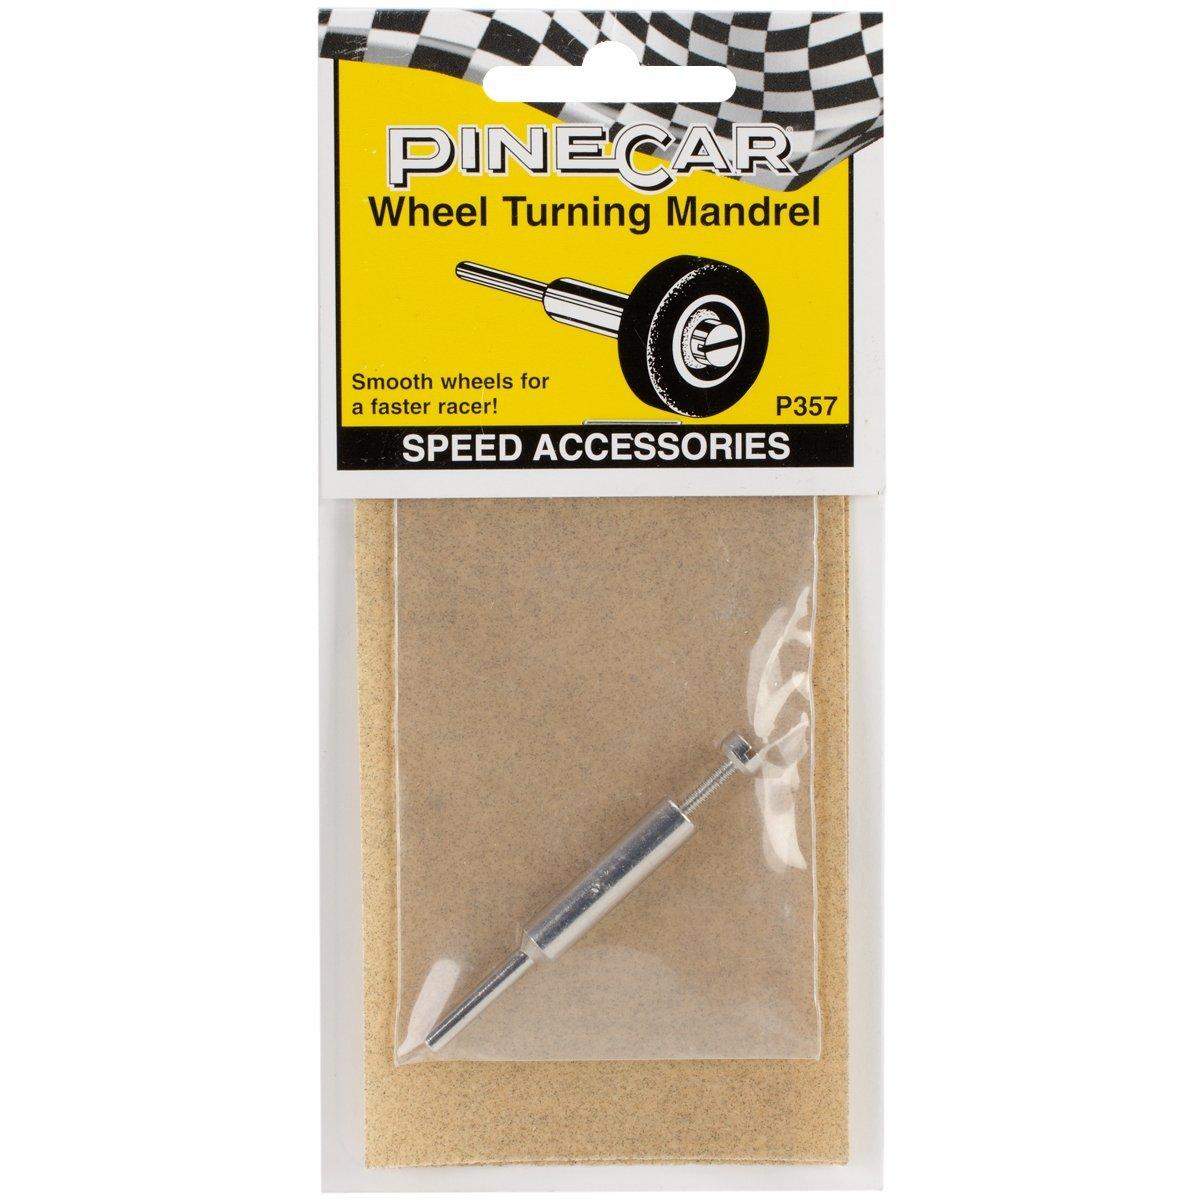 P357 Pine Car Derby Speed Accessories, Wheel Turning Mandrel